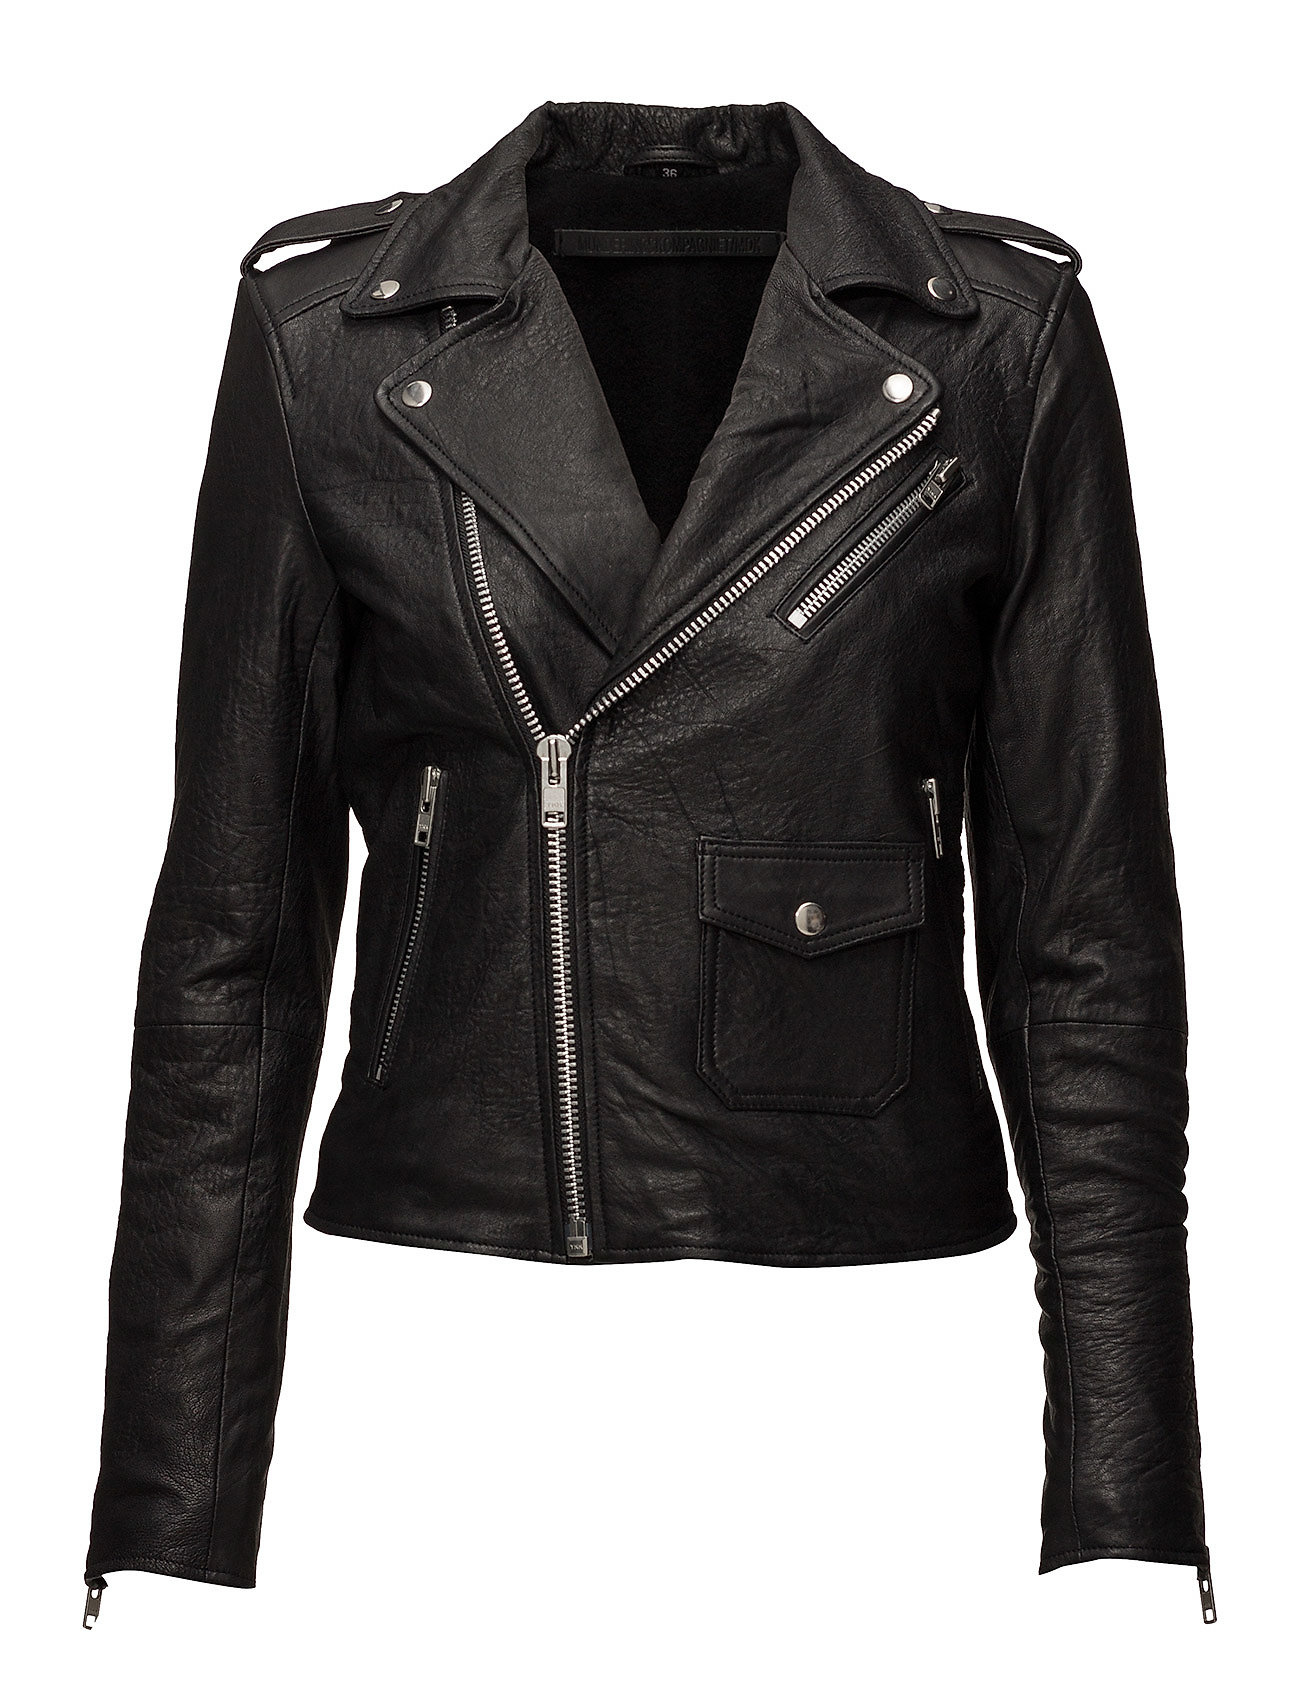 MDK / Munderingskompagniet Winter bubble biker jacket (black)